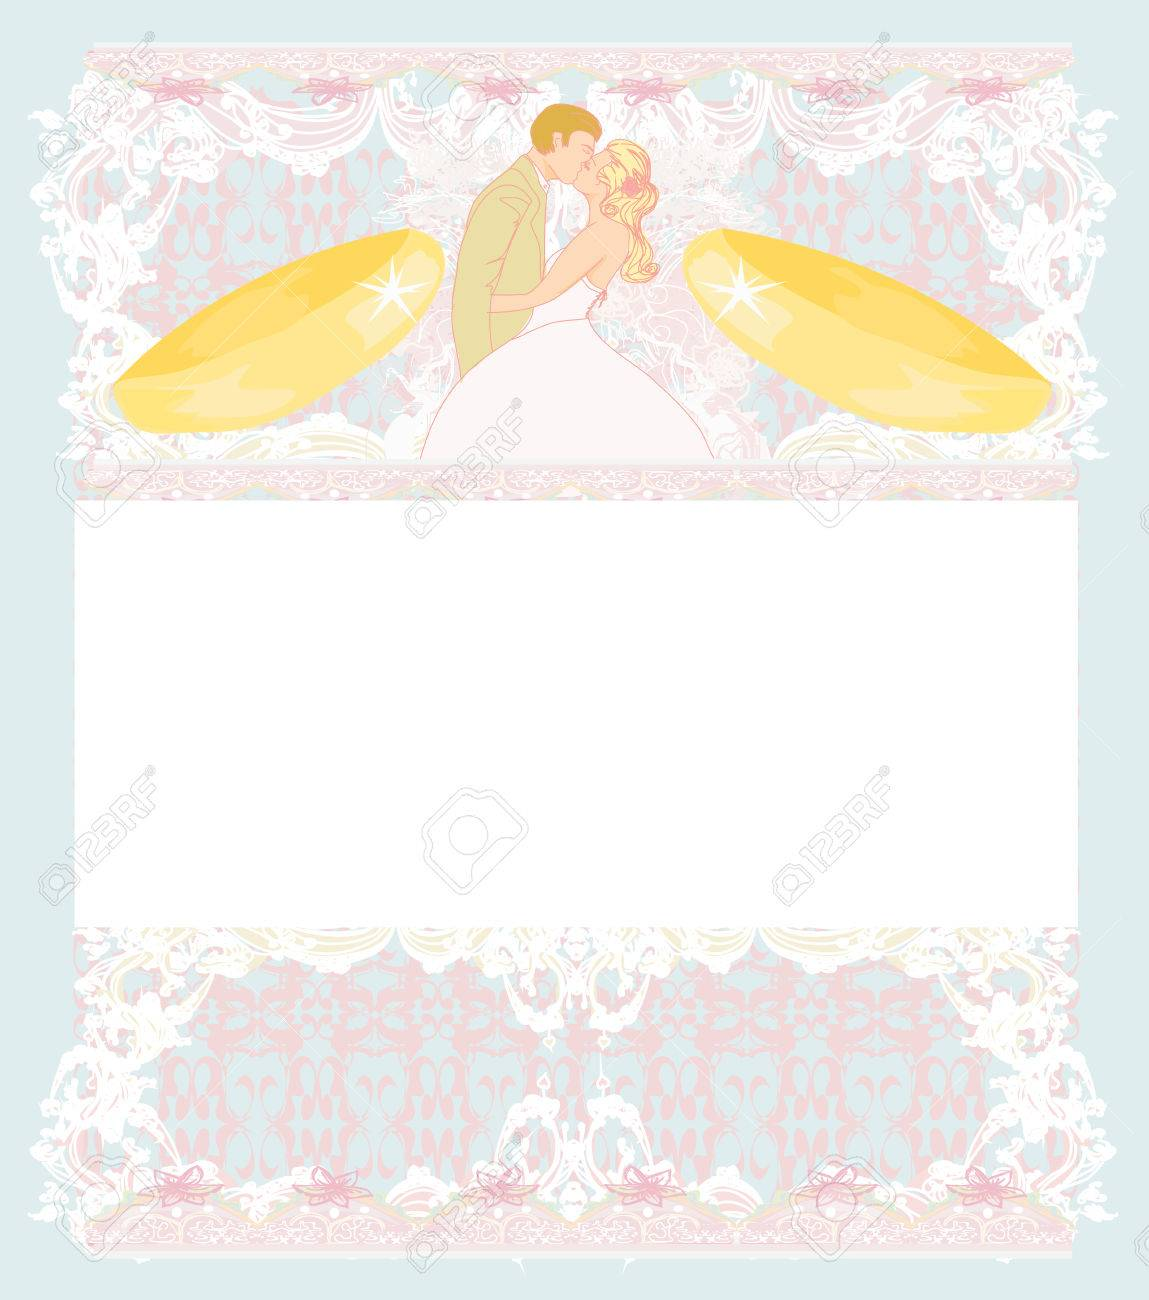 Stylish Wedding Invitation Card With Vintage Ornament Background ...